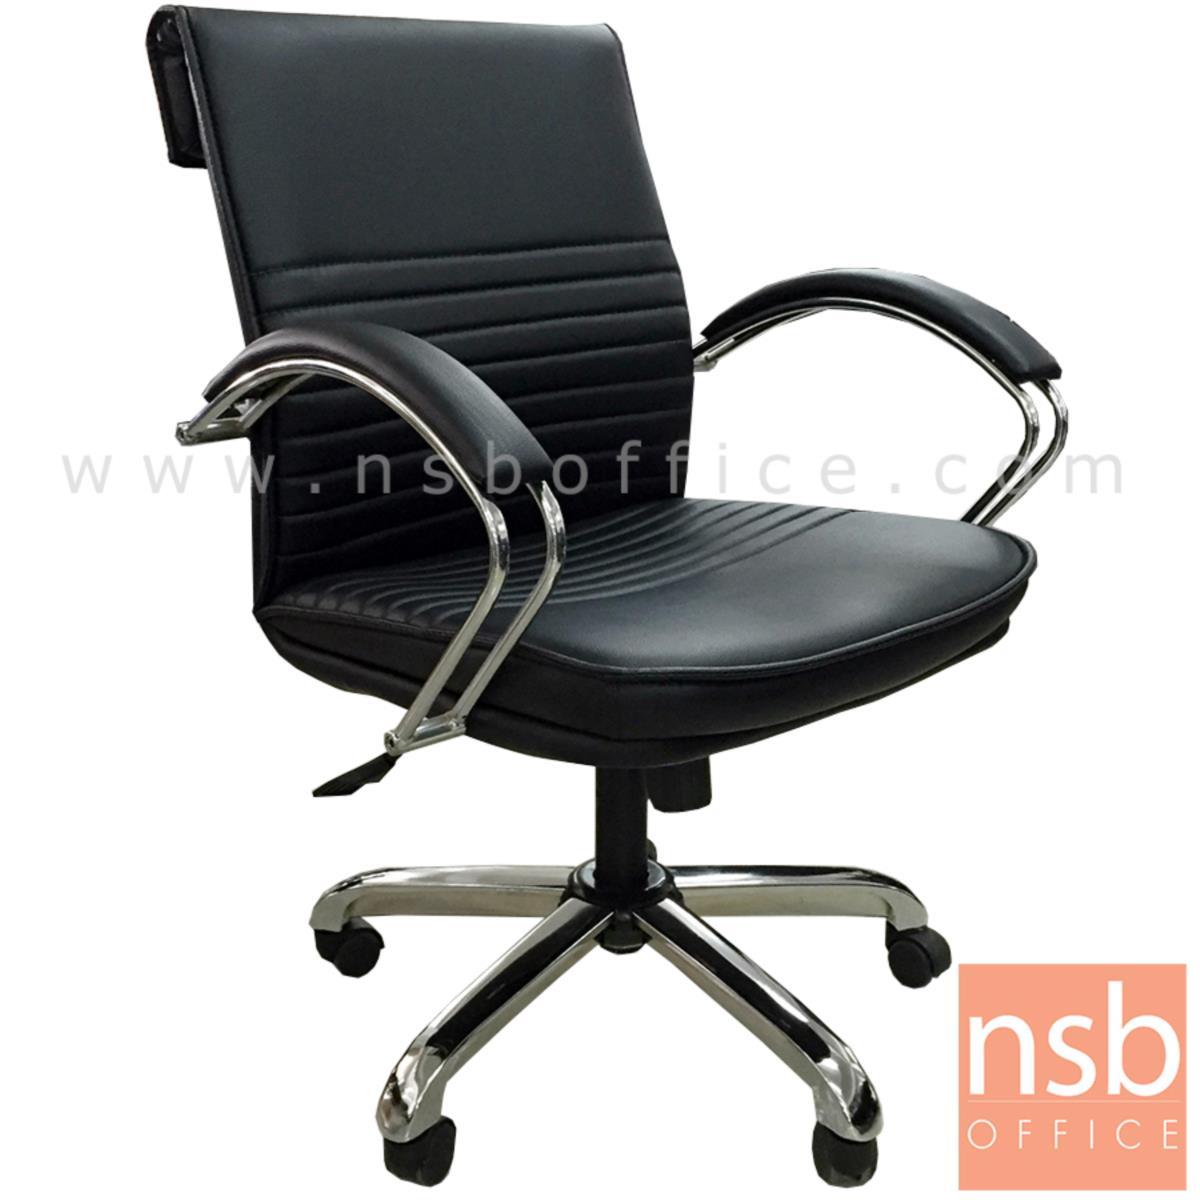 B03A309:เก้าอี้สำนักงาน รุ่น KS-110S  โช๊คแก๊ส มีก้อนโยก ขาเหล็กชุบโครเมี่ยม